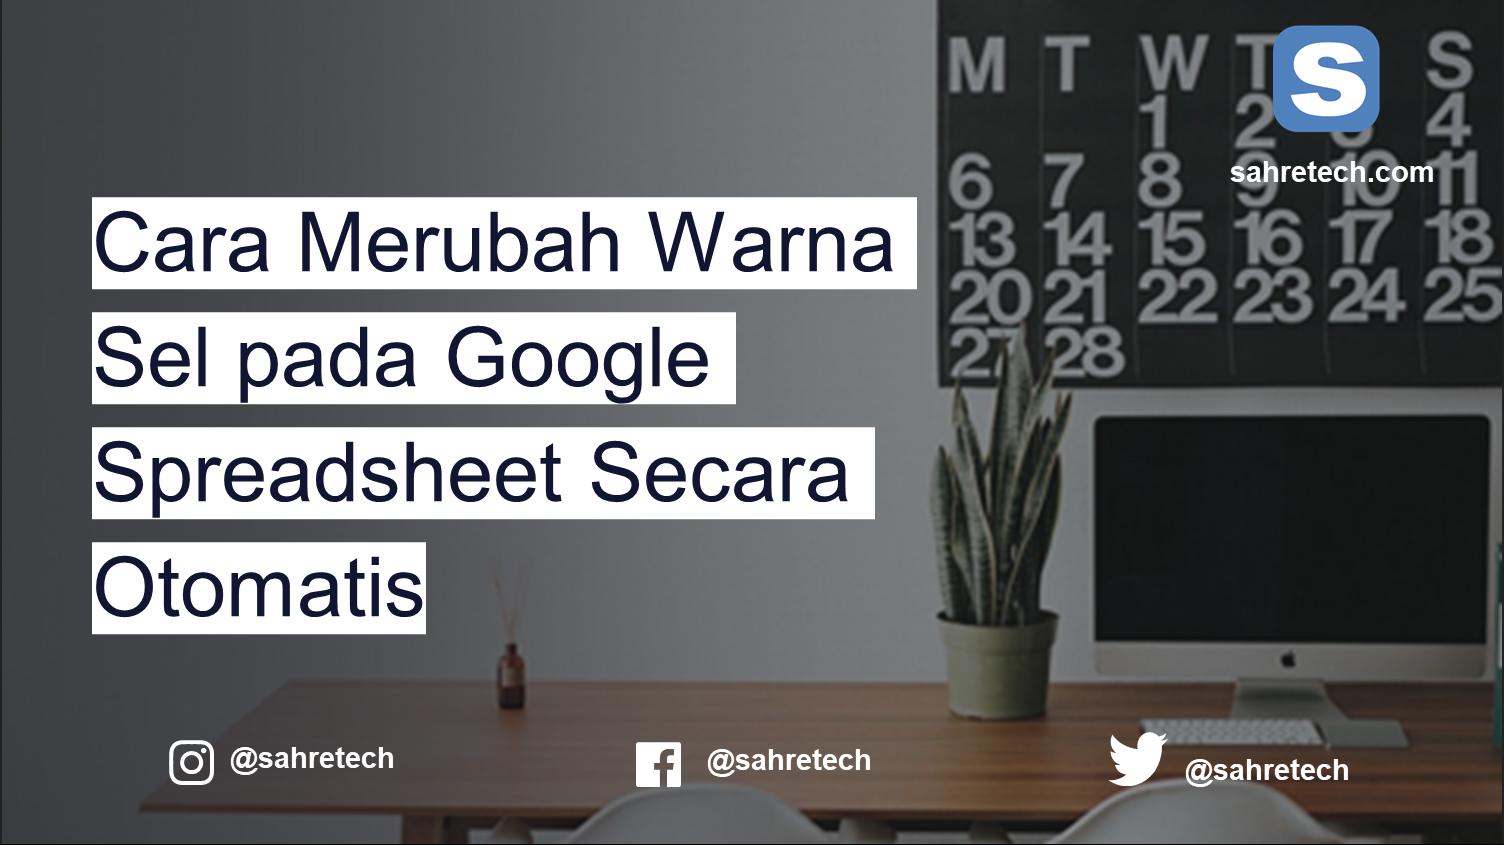 Cara Merubah Warna Sel Pada Google Spreadsheet Secara Otomatis Sahretech